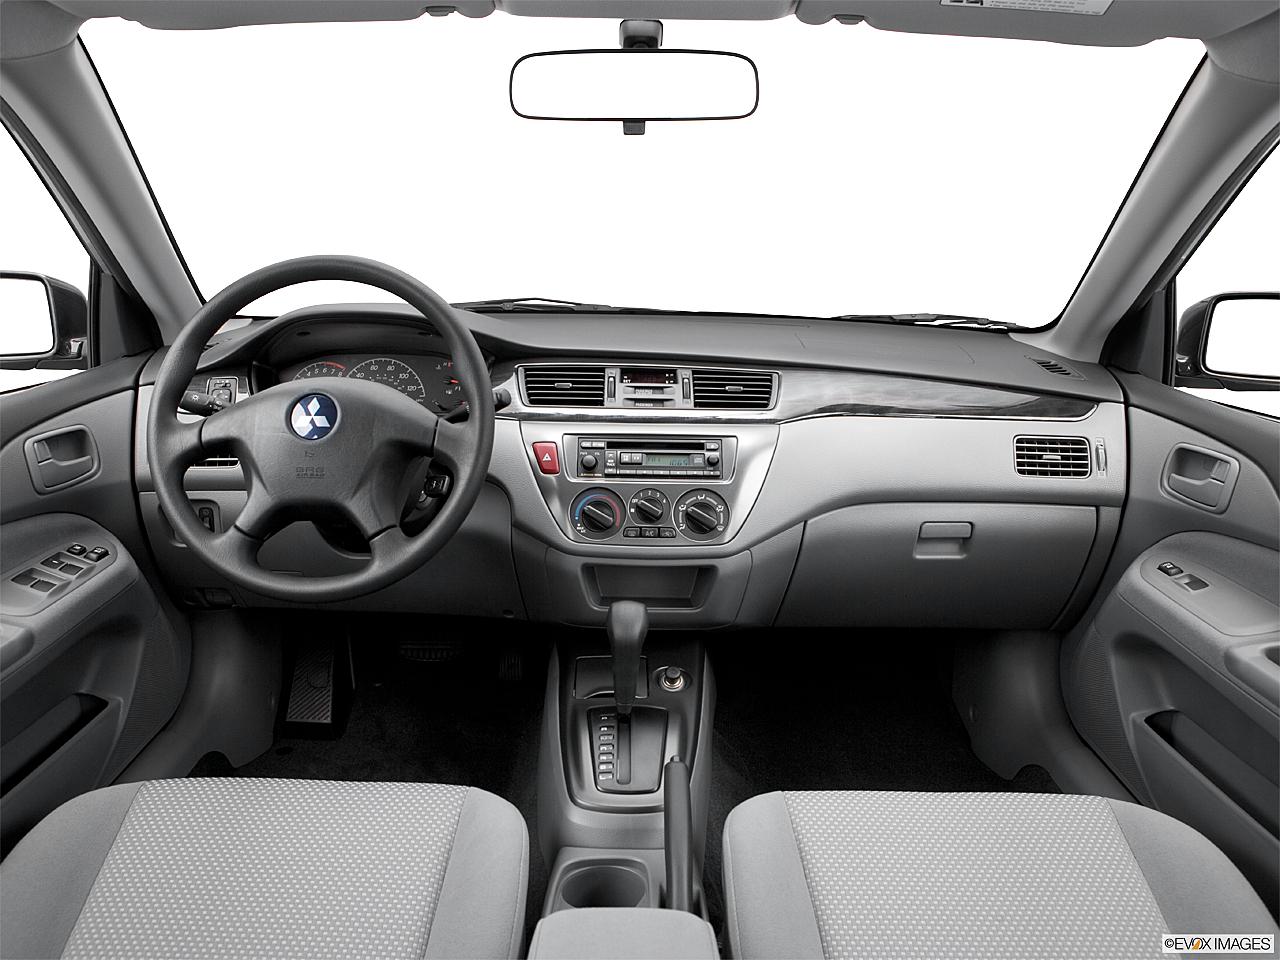 2006 mitsubishi lancer o z rally 4dr sedan w manual. Black Bedroom Furniture Sets. Home Design Ideas